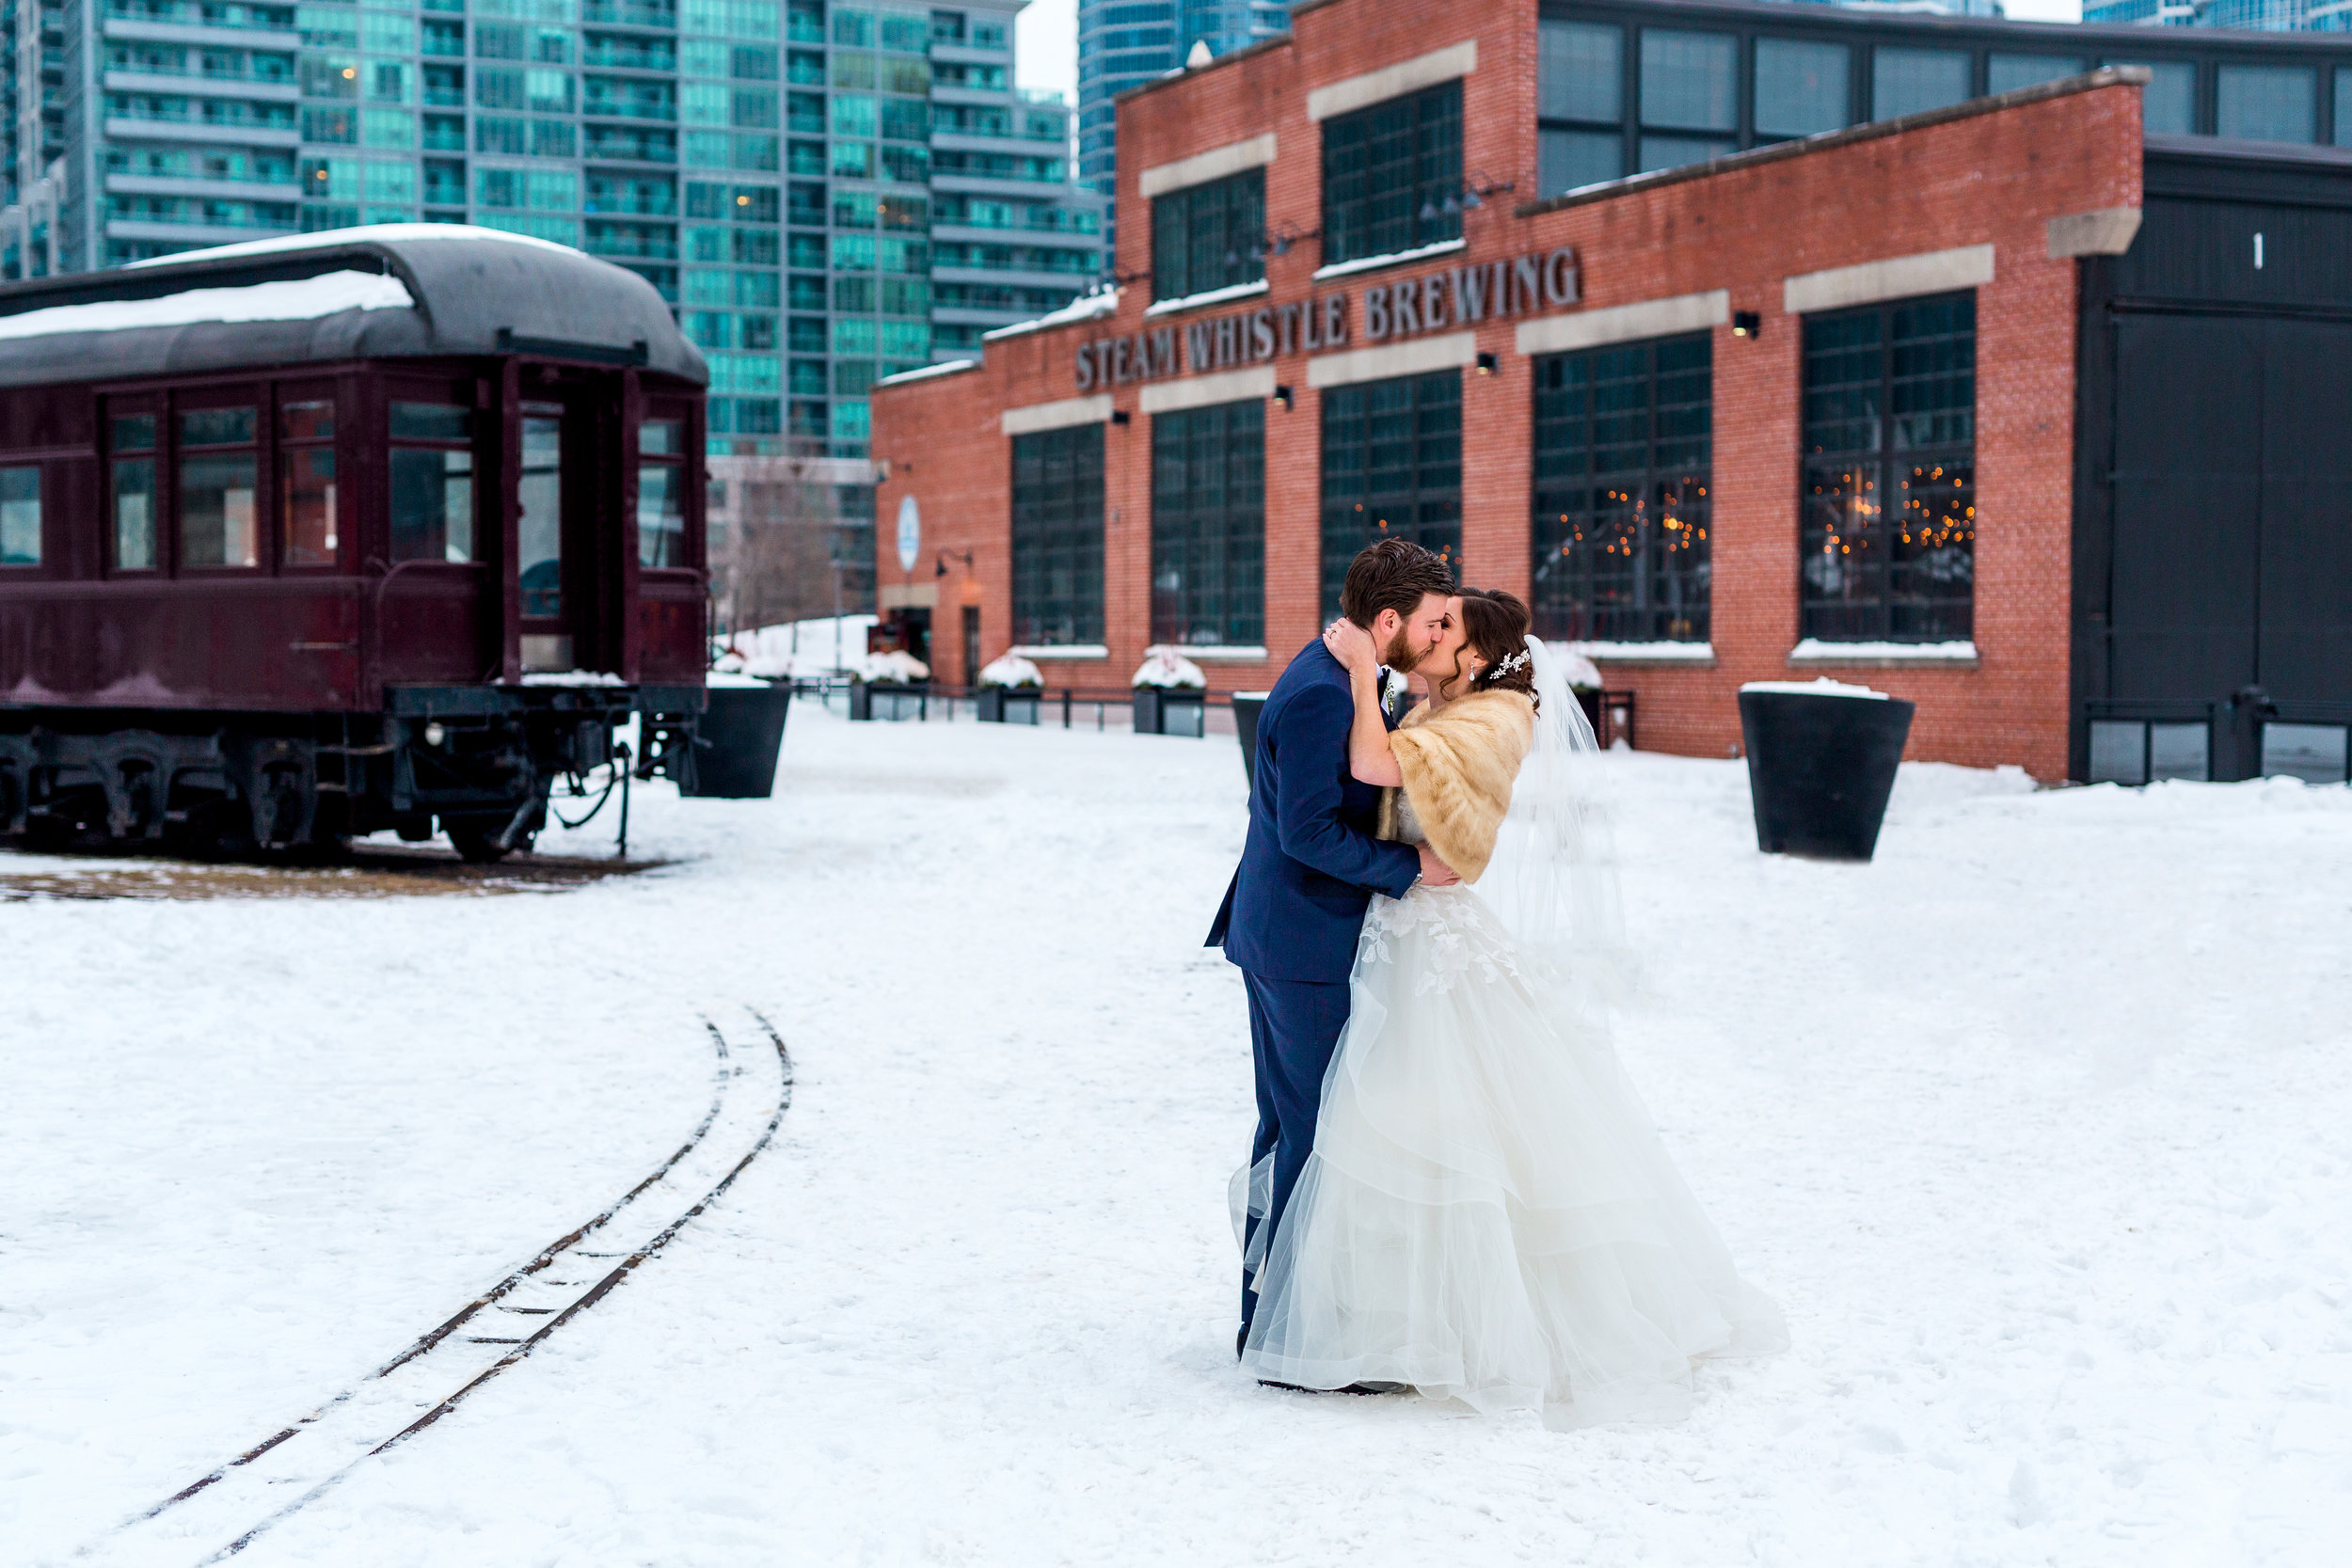 Amir_Danielle_Whitfield_Wedding_Steam_Whistle_Toronto_344.jpg